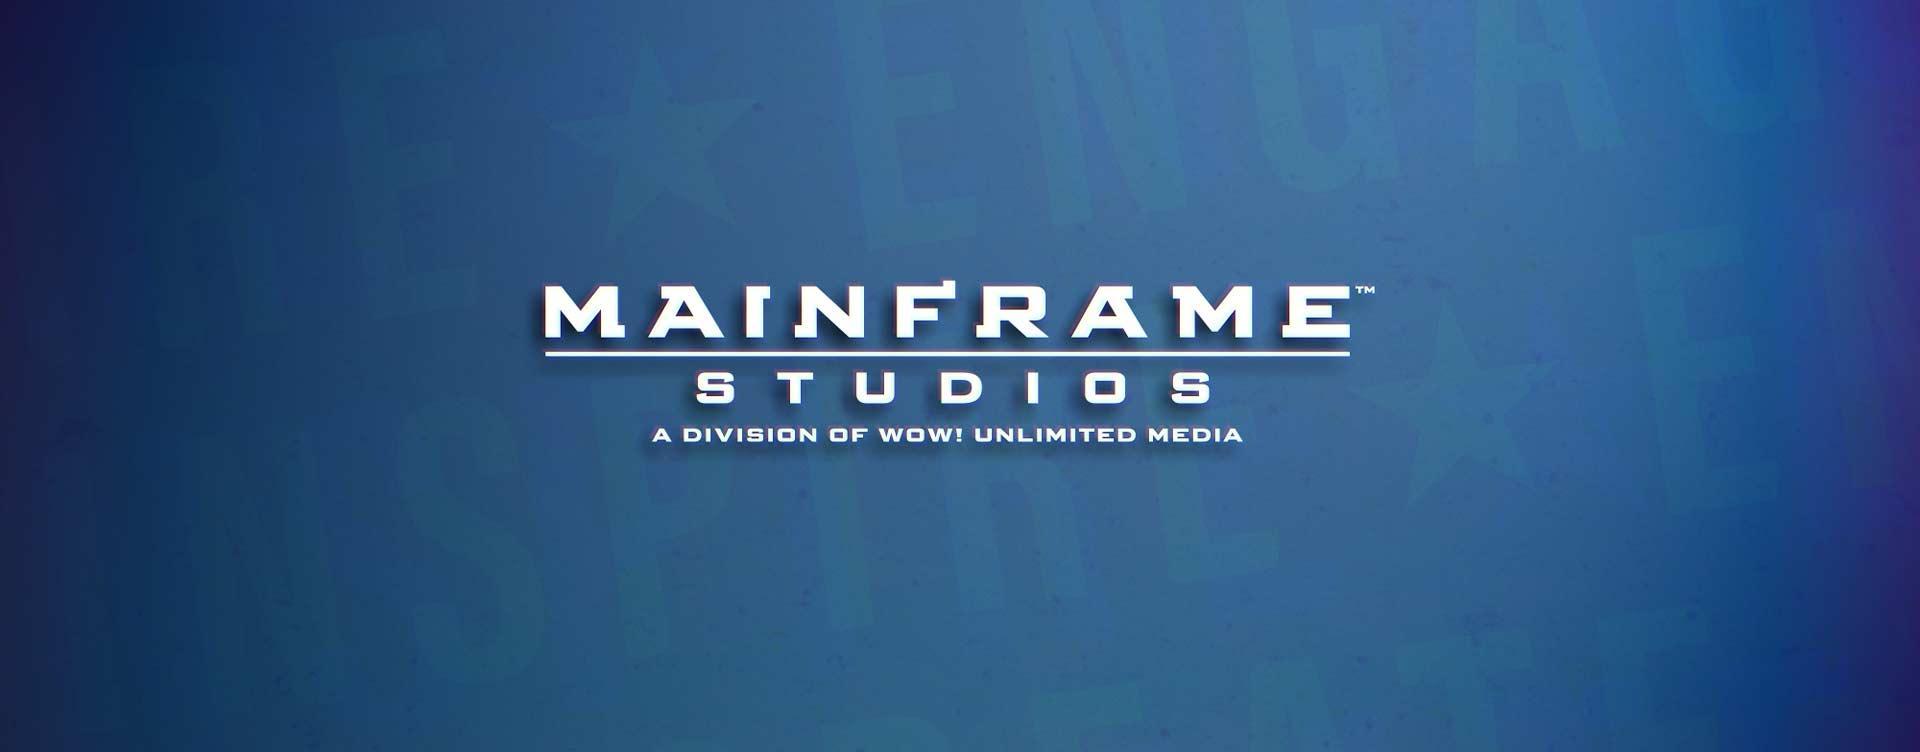 Mainframe studios header